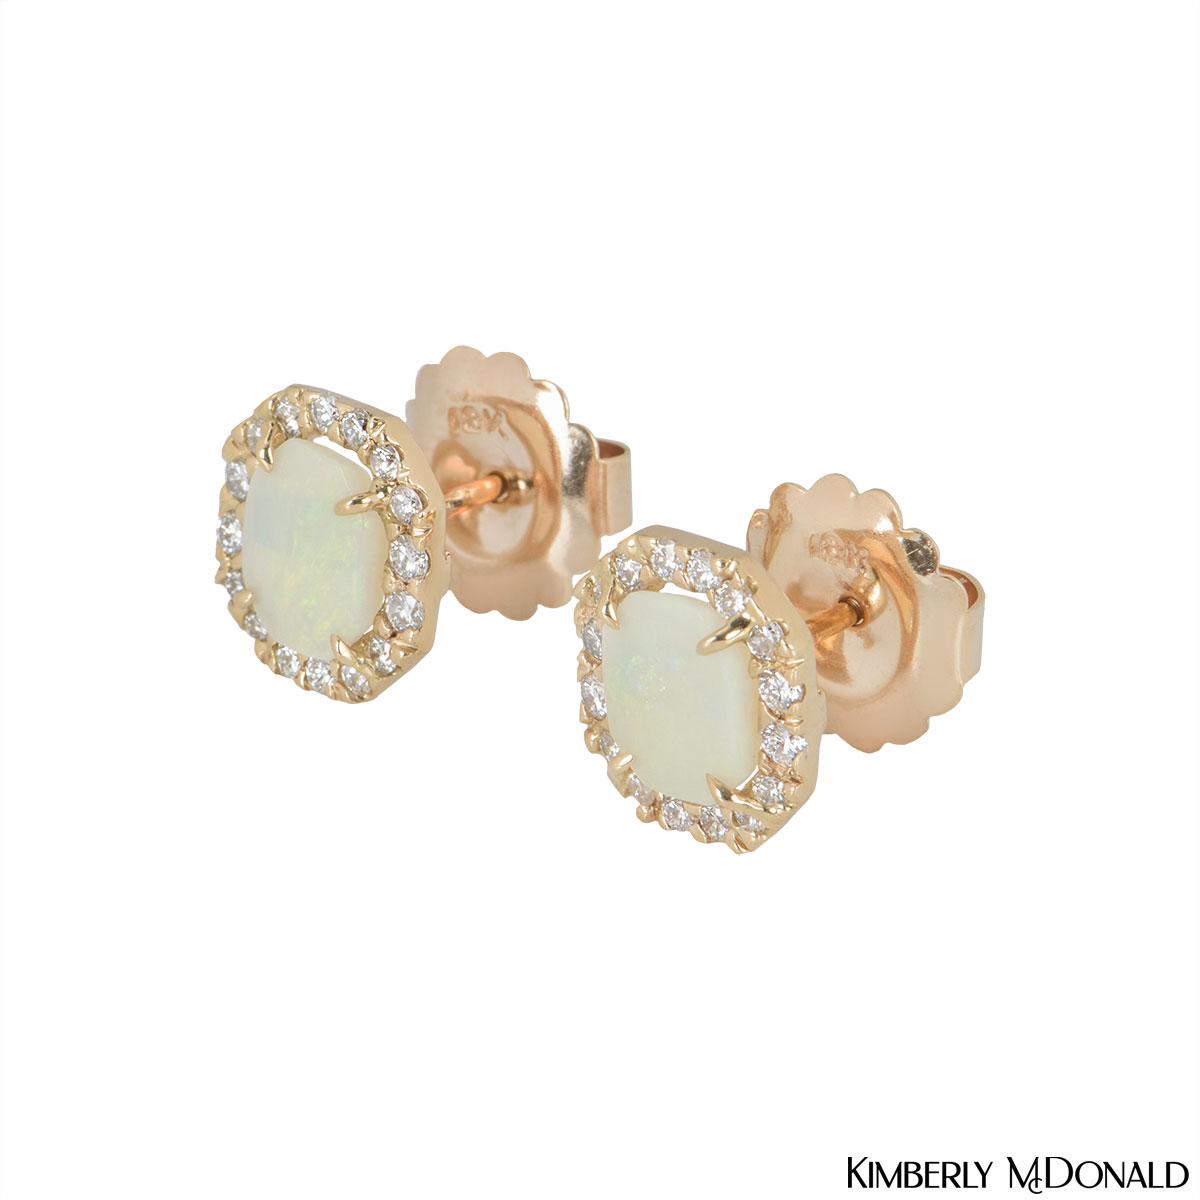 Kimberly McDonald Rose Gold Opal & Diamond Earrings